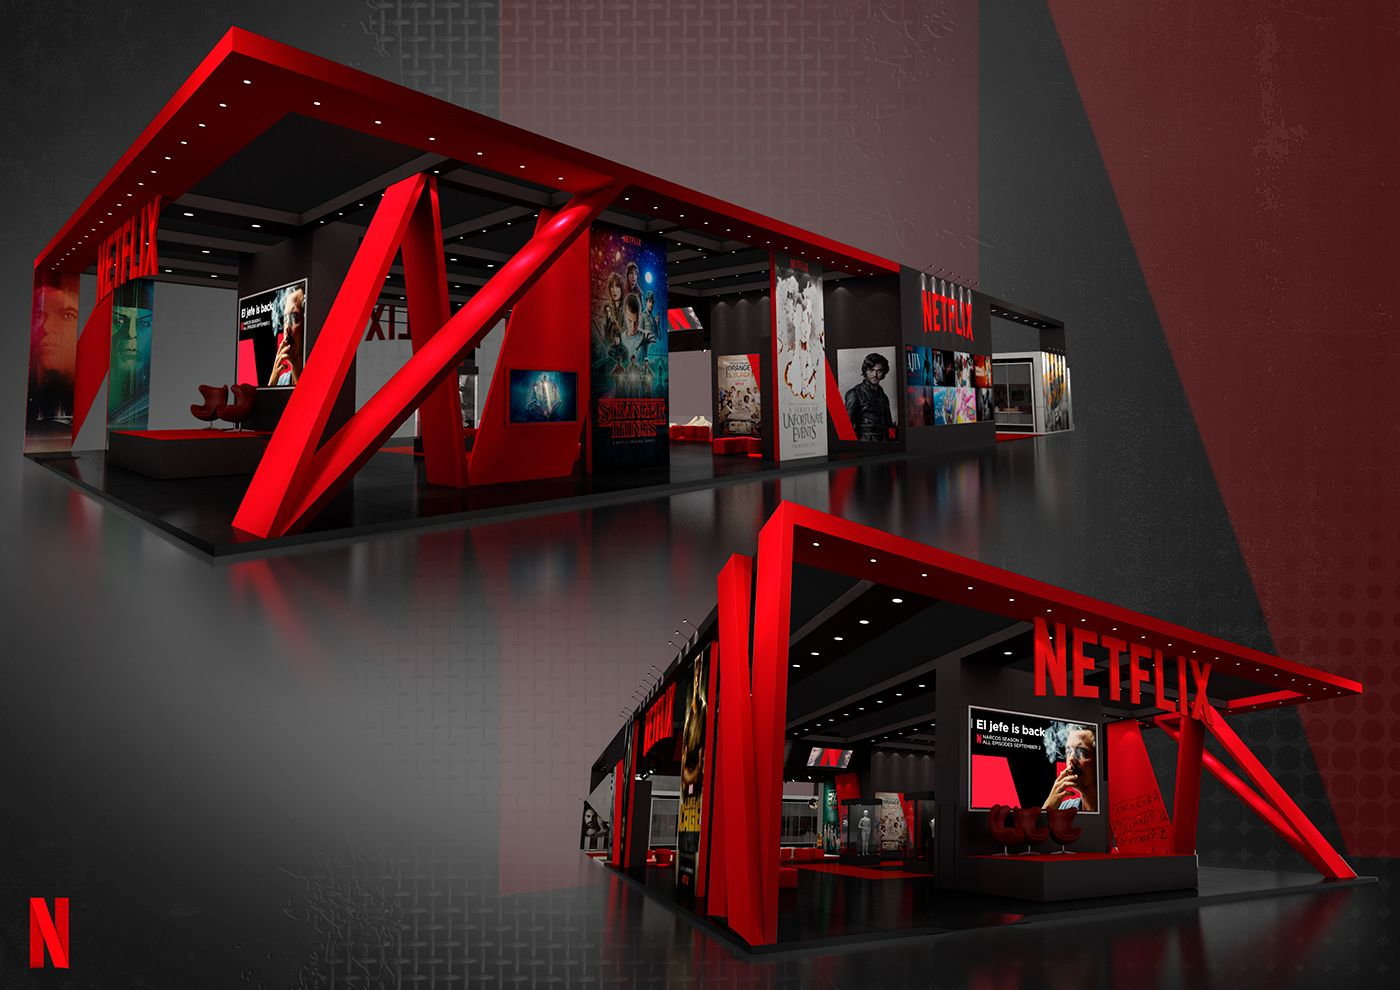 Netflix Ccxp 2016 On Behance Exibition Design Exhibition Stand Design Booth Design